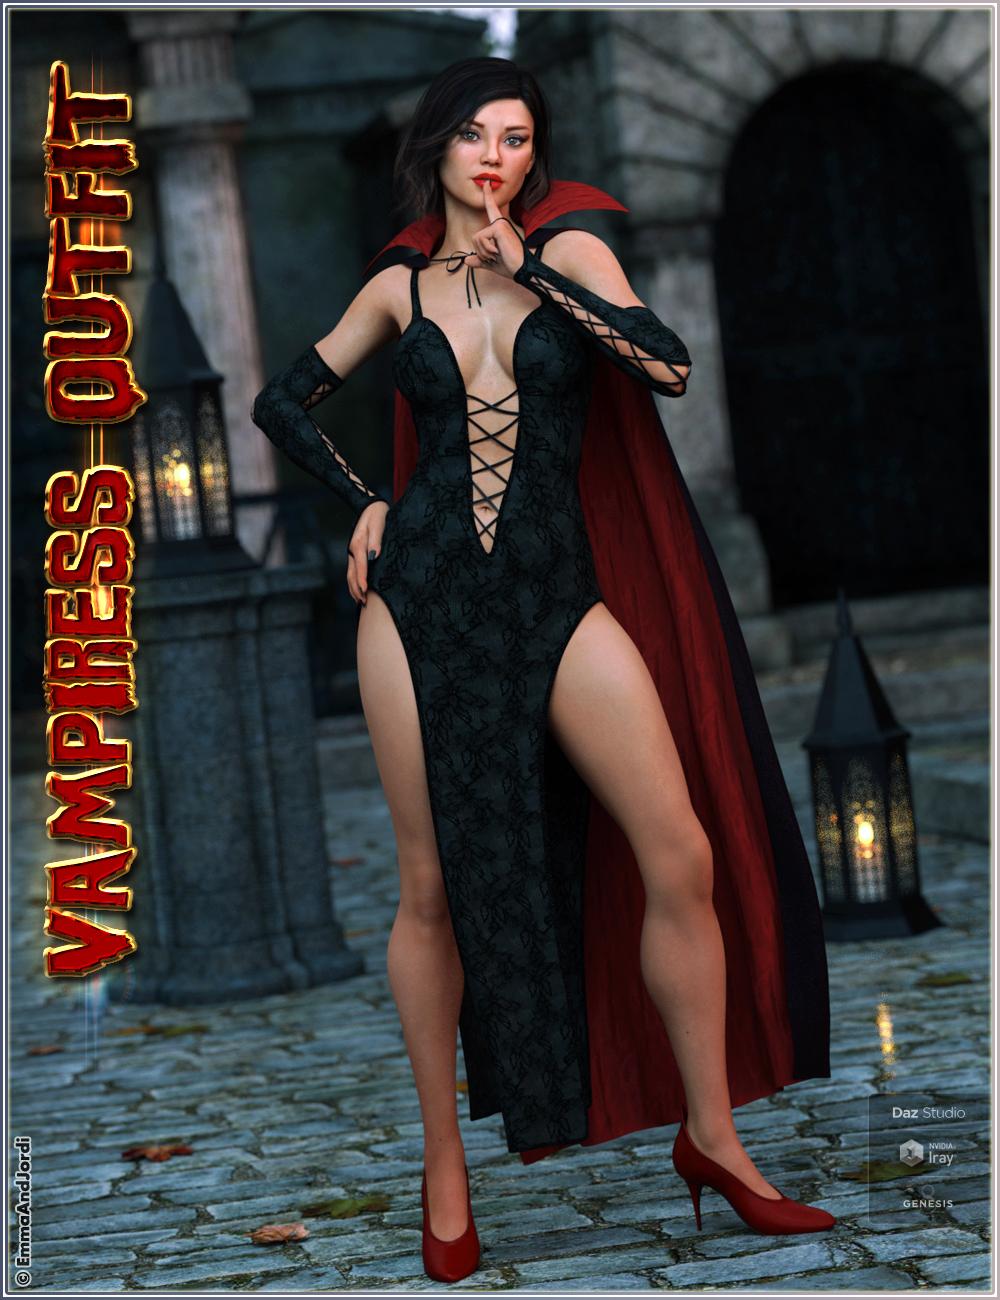 dForce Vampiress Outfit and Poses For Genesis 8 Female(s) by: EmmaAndJordi, 3D Models by Daz 3D